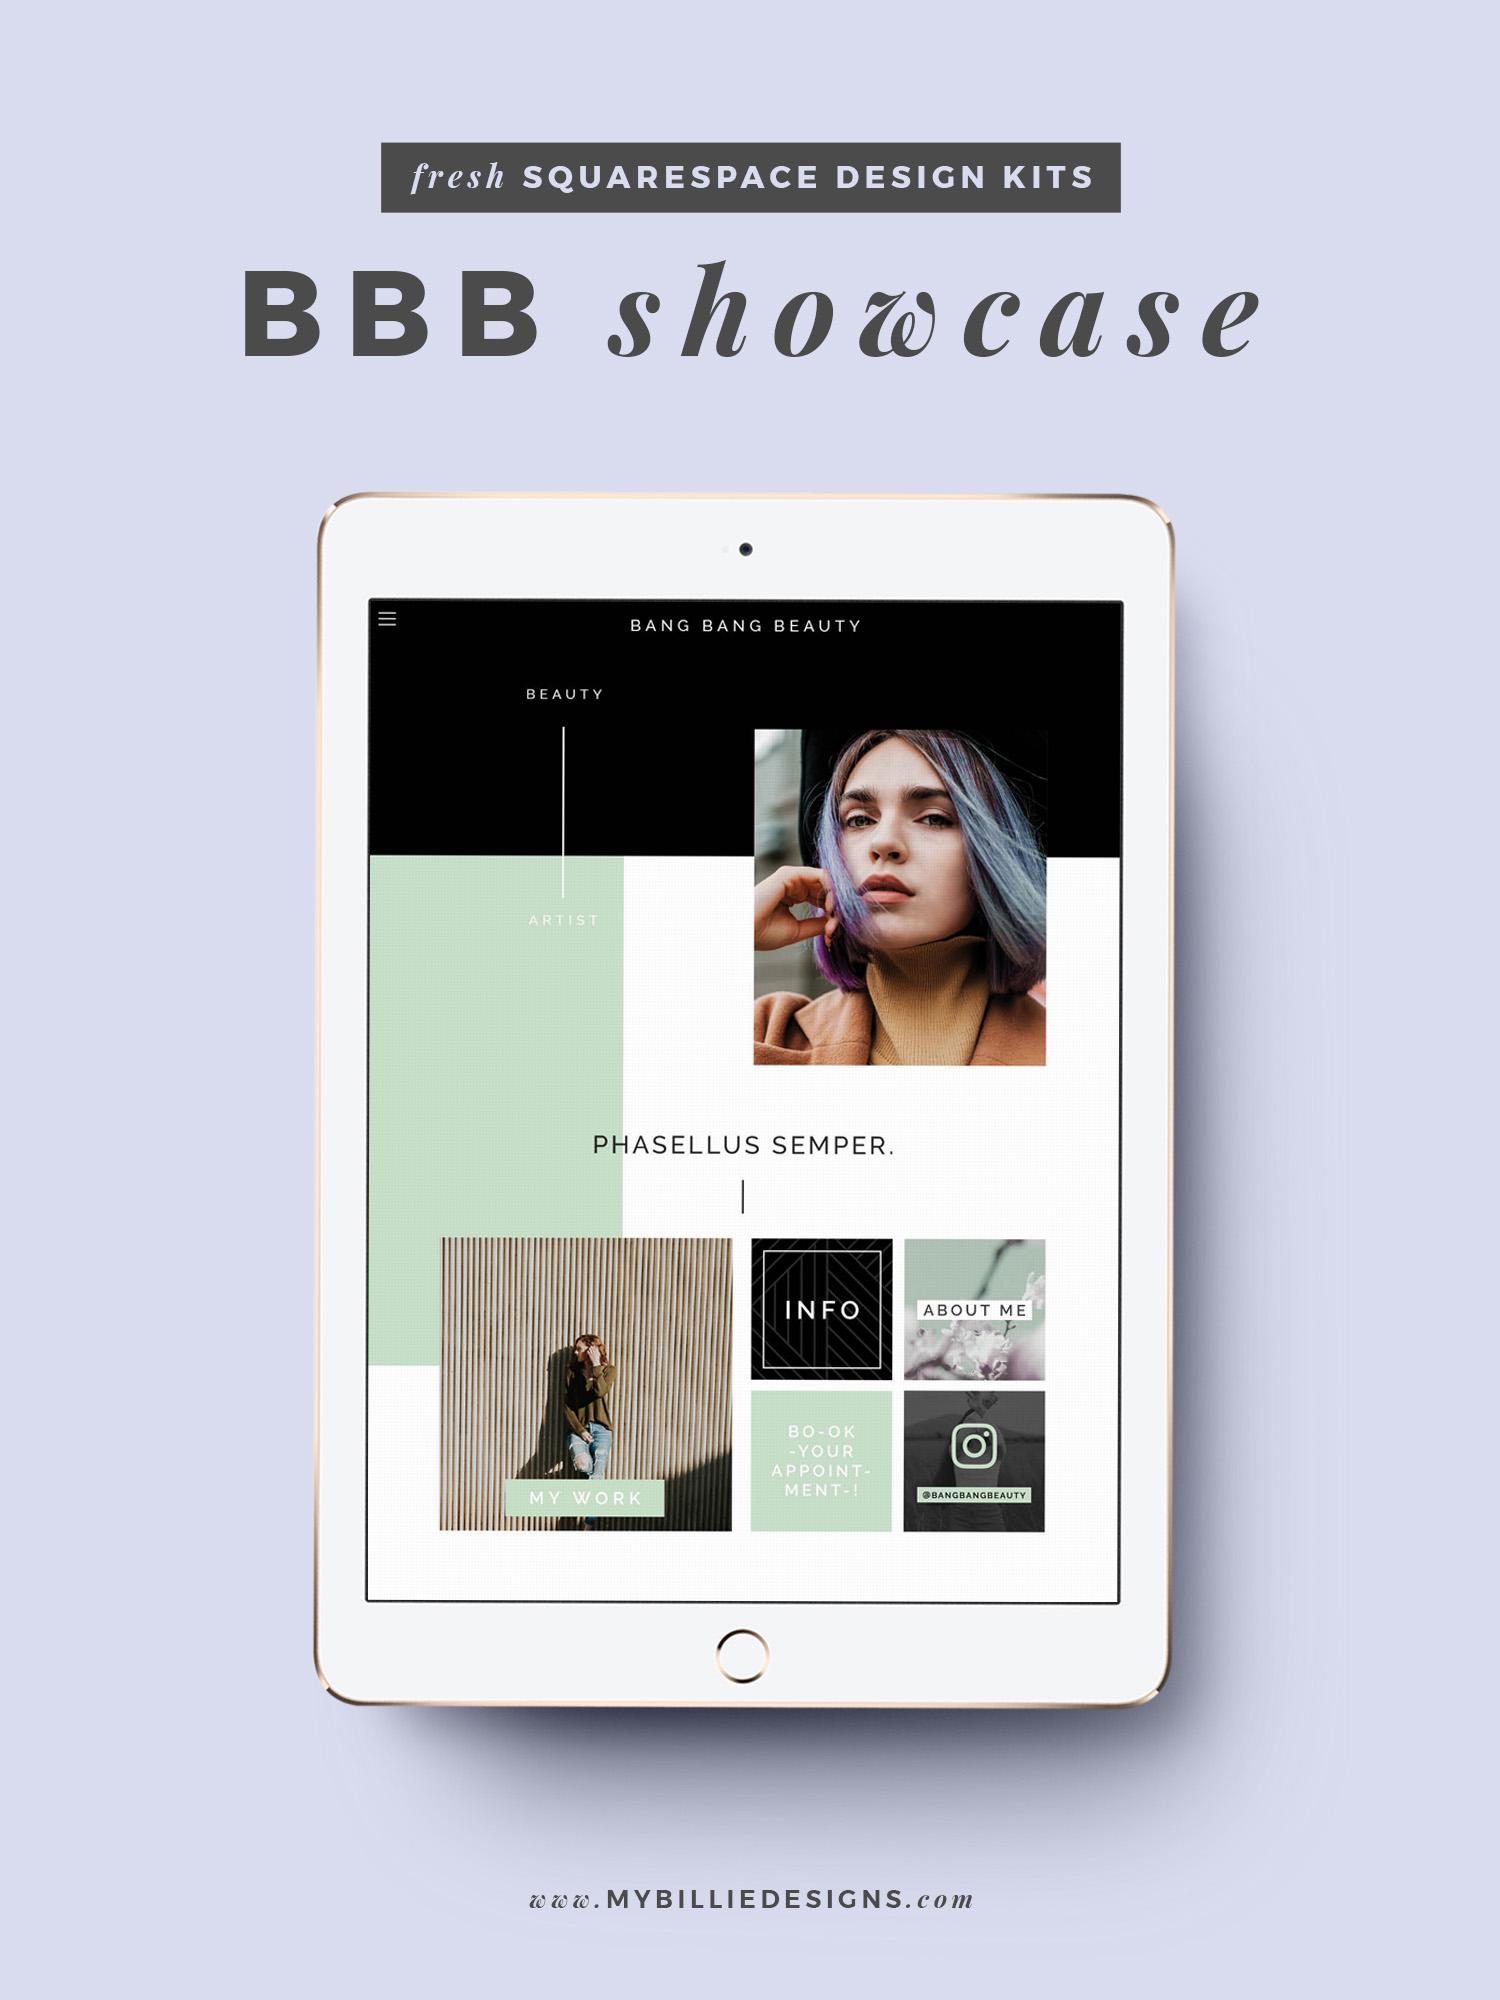 MBD Squarespace Design Kits | BBB Design + Customization Ideas